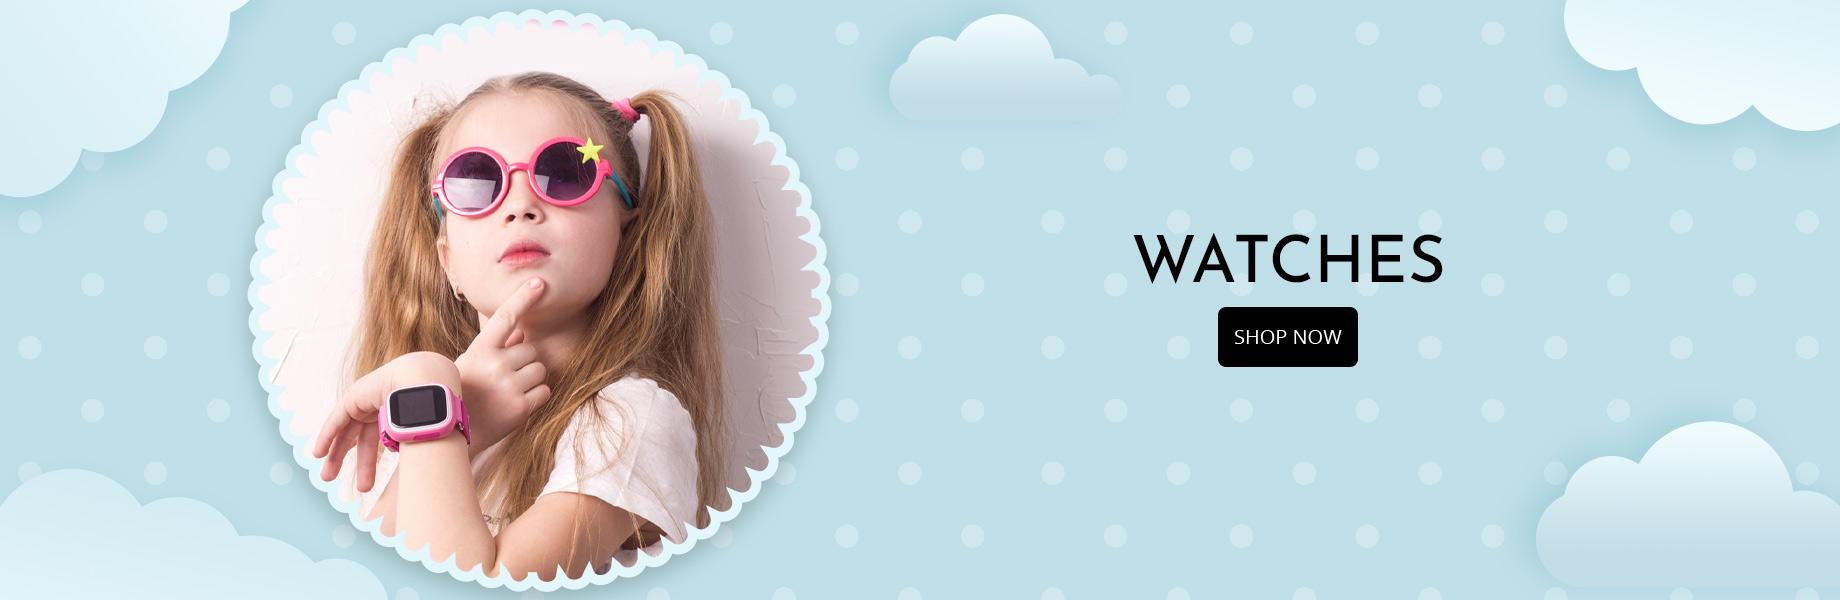 Kids-Page-Carousals-Watches-Web.jpg